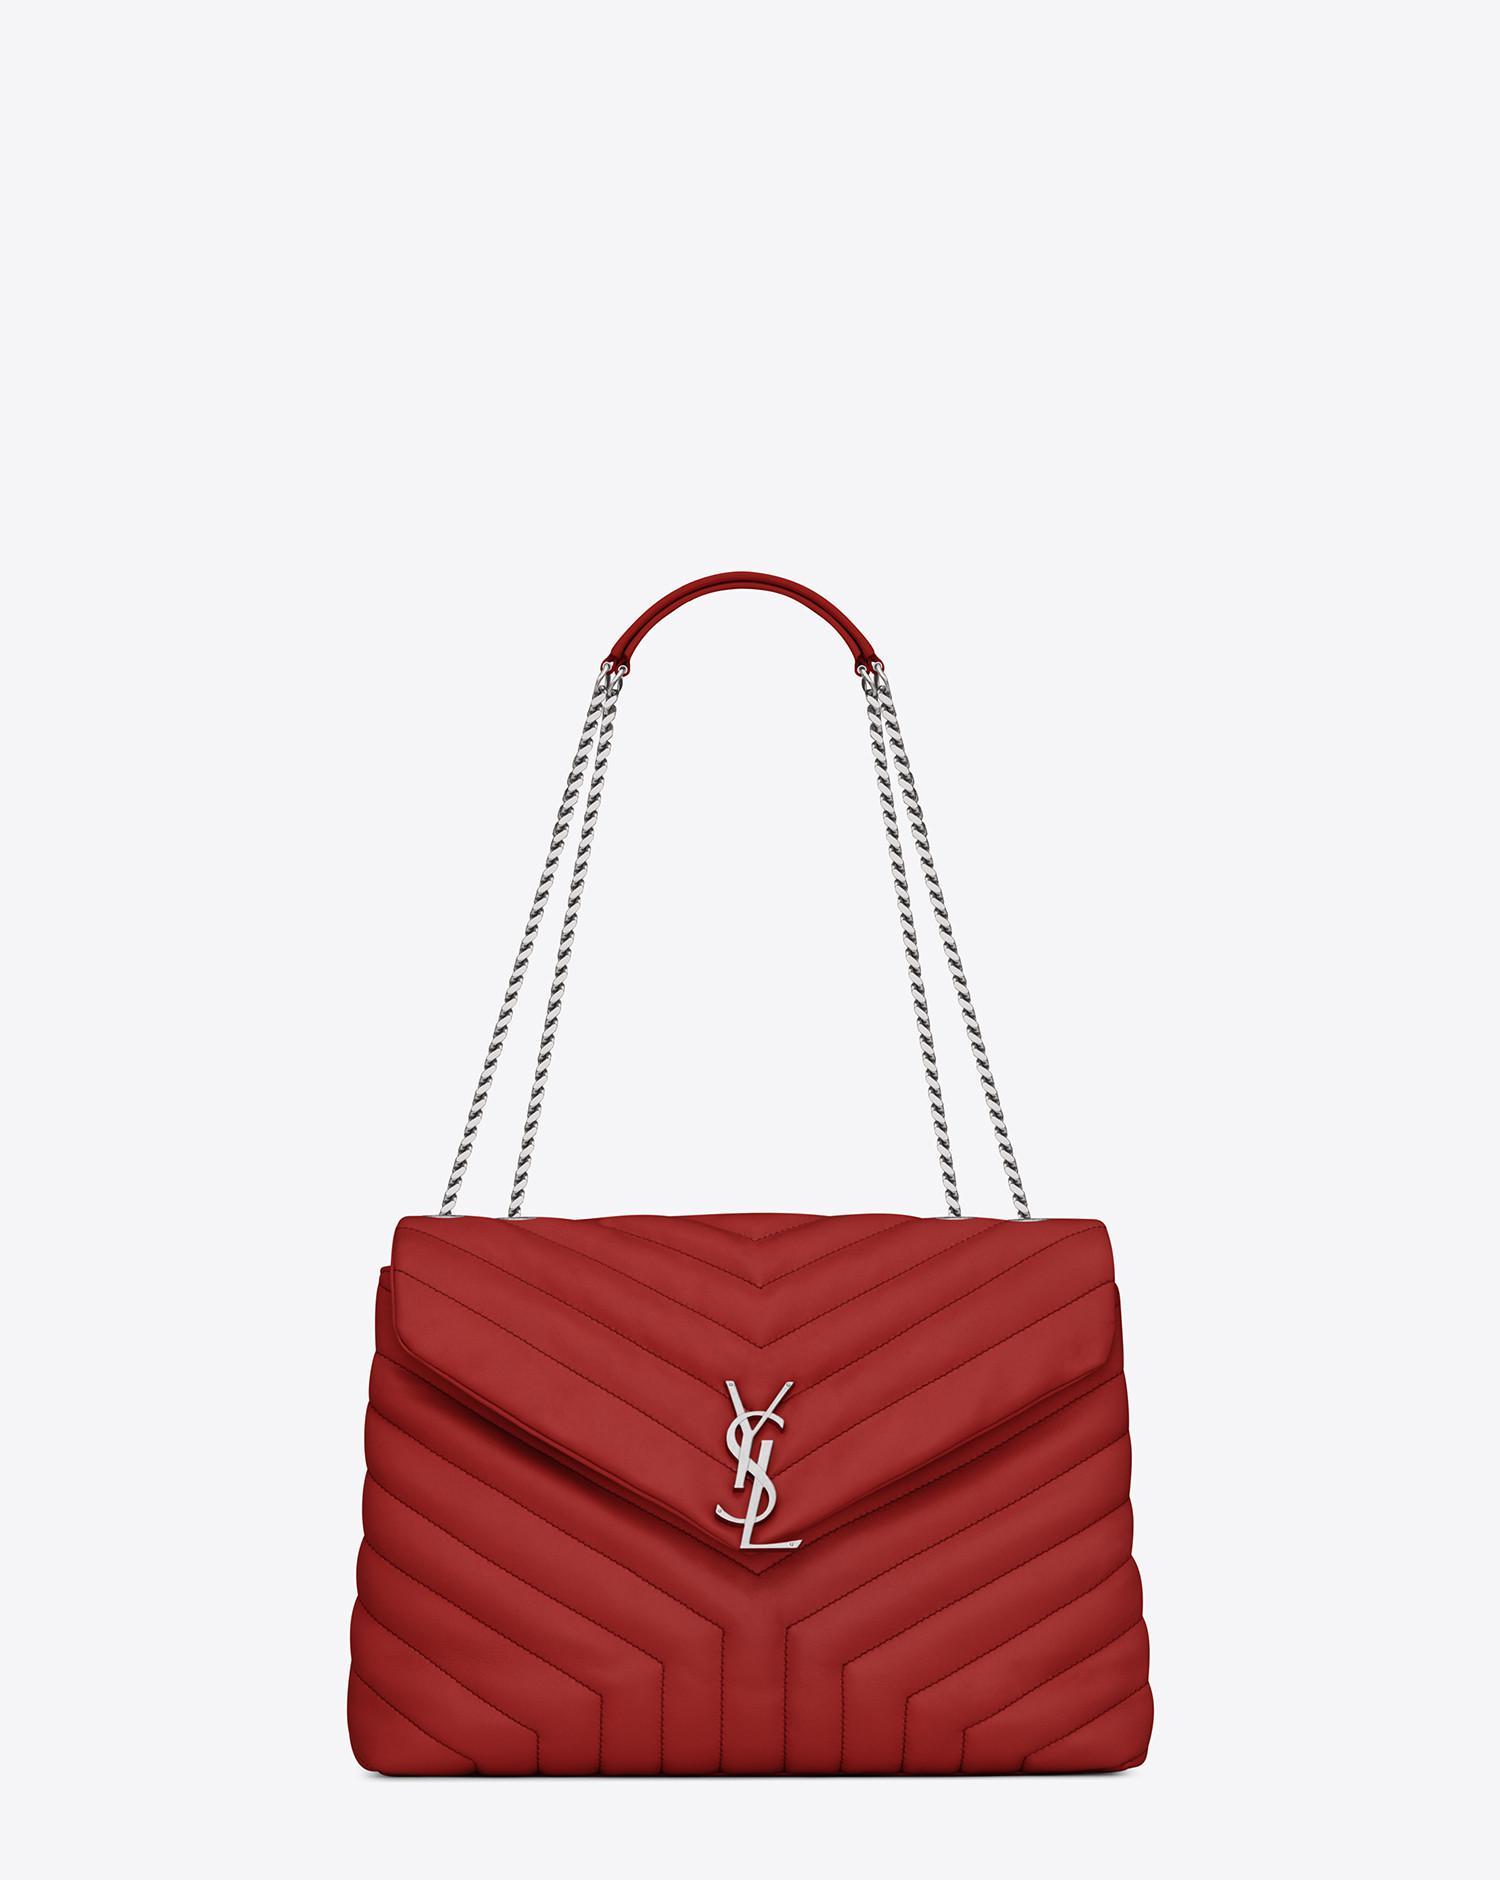 Saint Laurent. Women's Medium Loulou Monogram Chain Bag In Lipstick Red